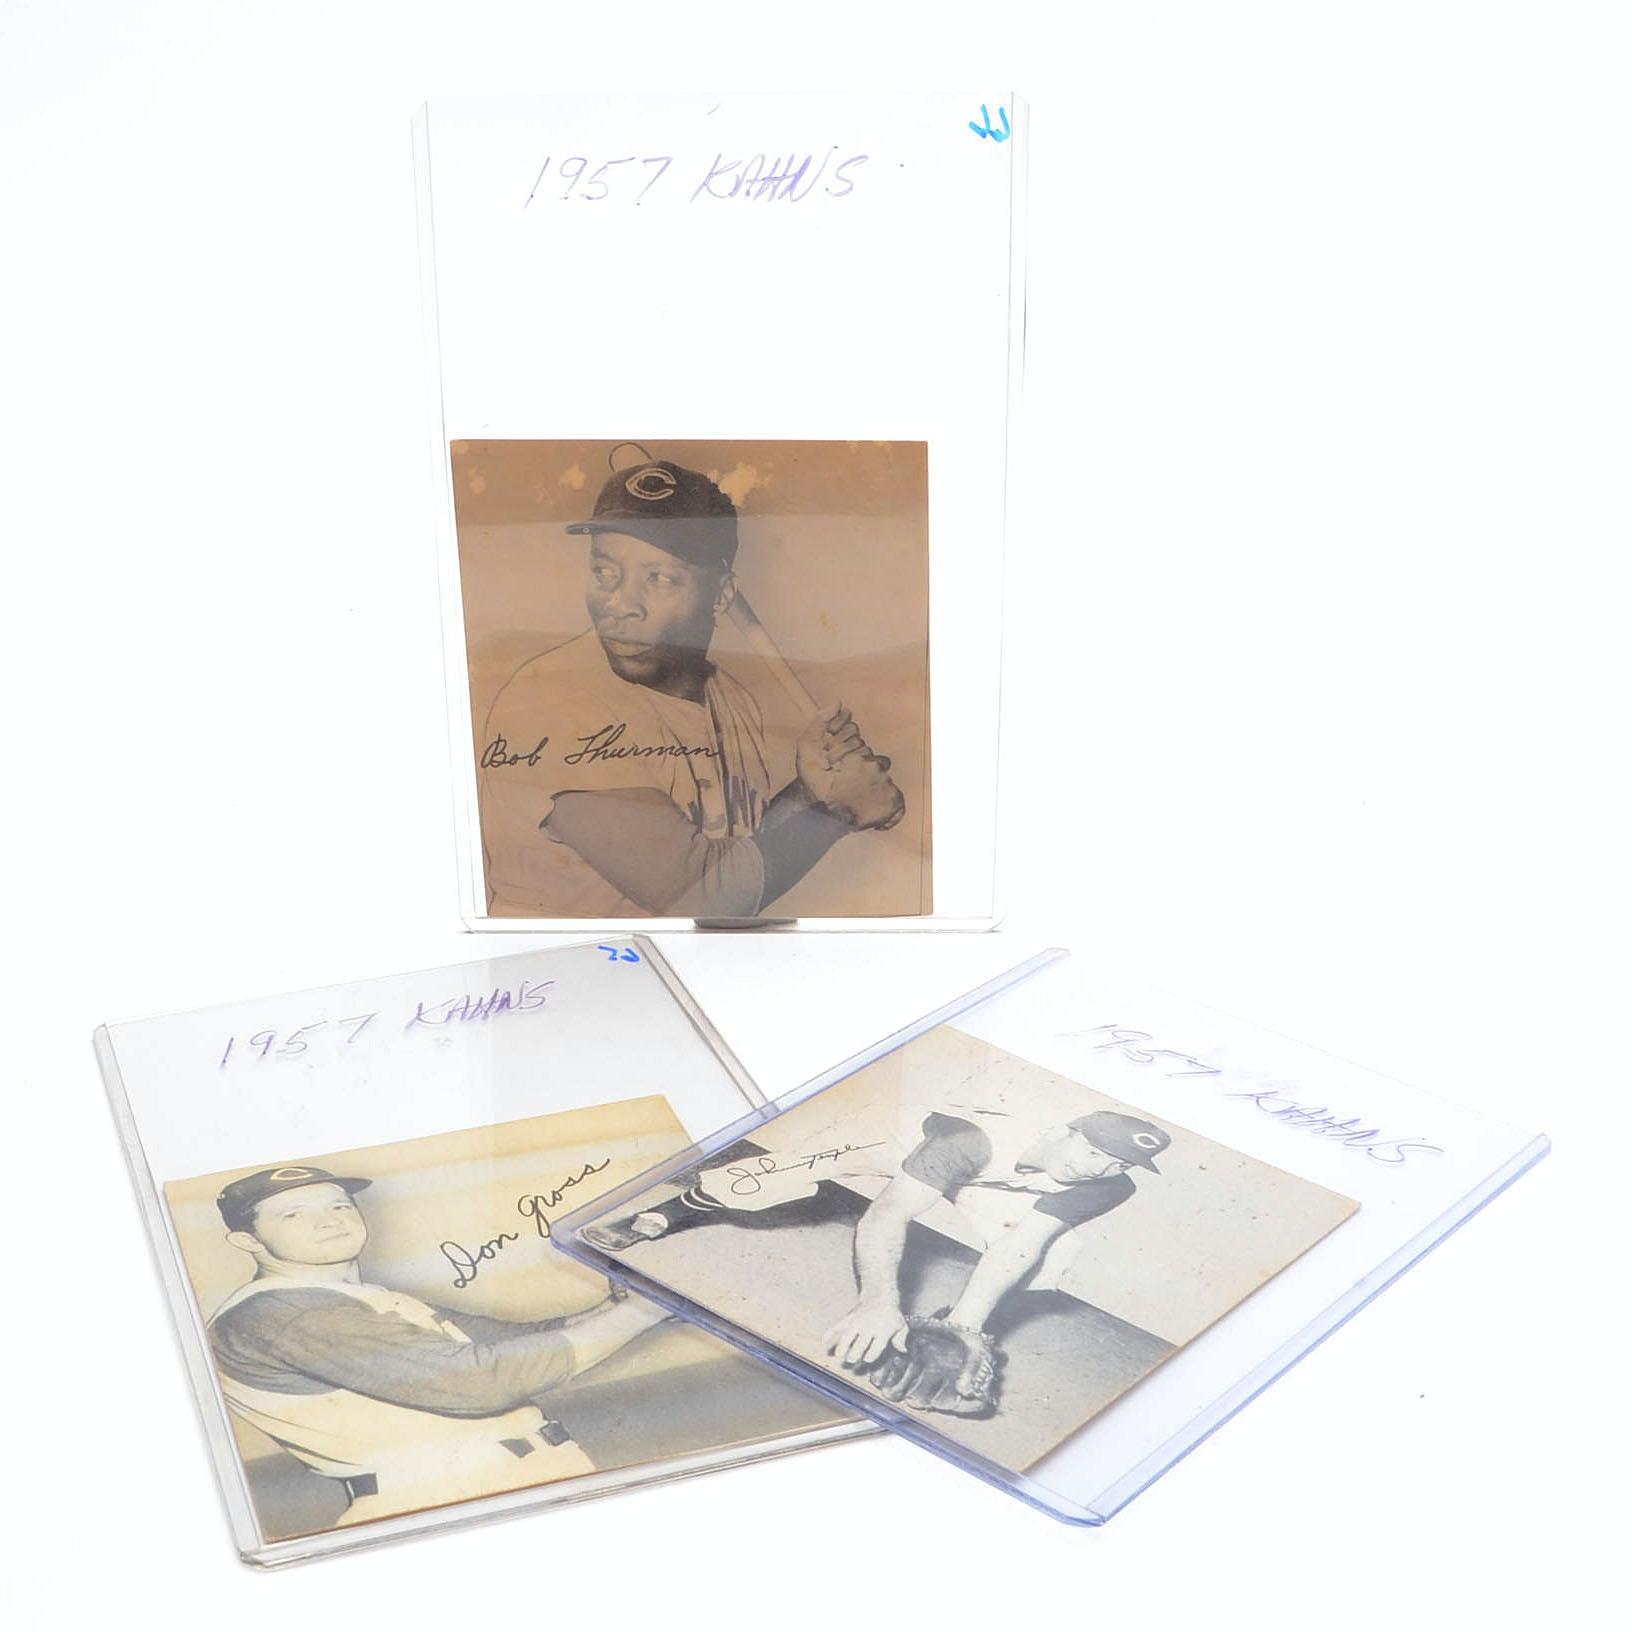 1957 Temple, Thurman, and Gross 1957 Kahn's Reds Cards